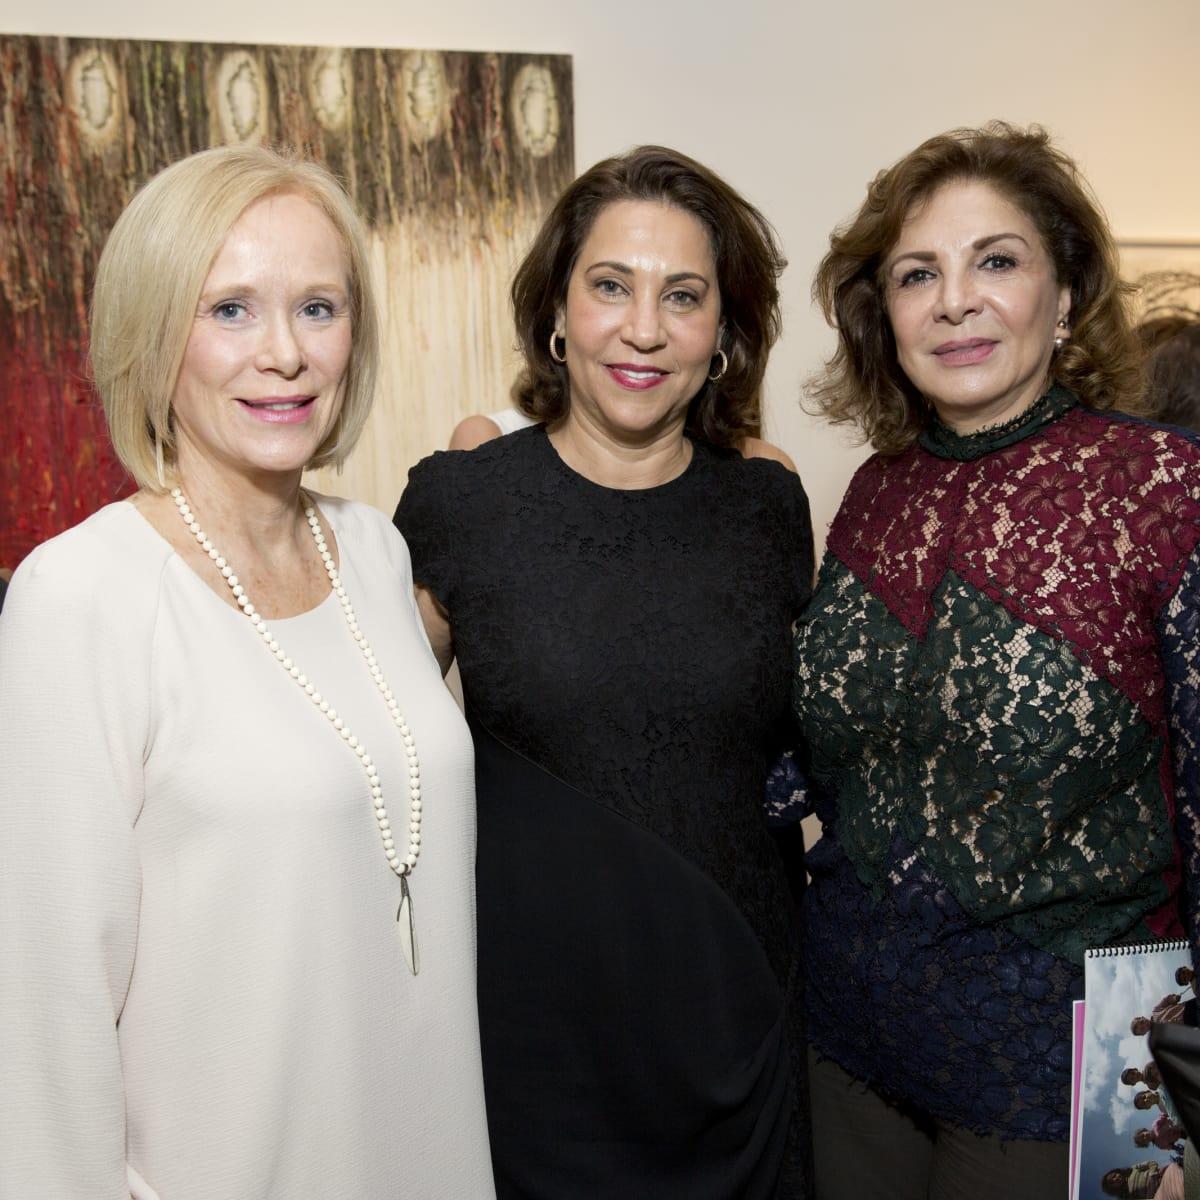 UNICEF Art Auction, 5/16 Louise Chehlaoui, Alma Kantarjian, Chaida Midani